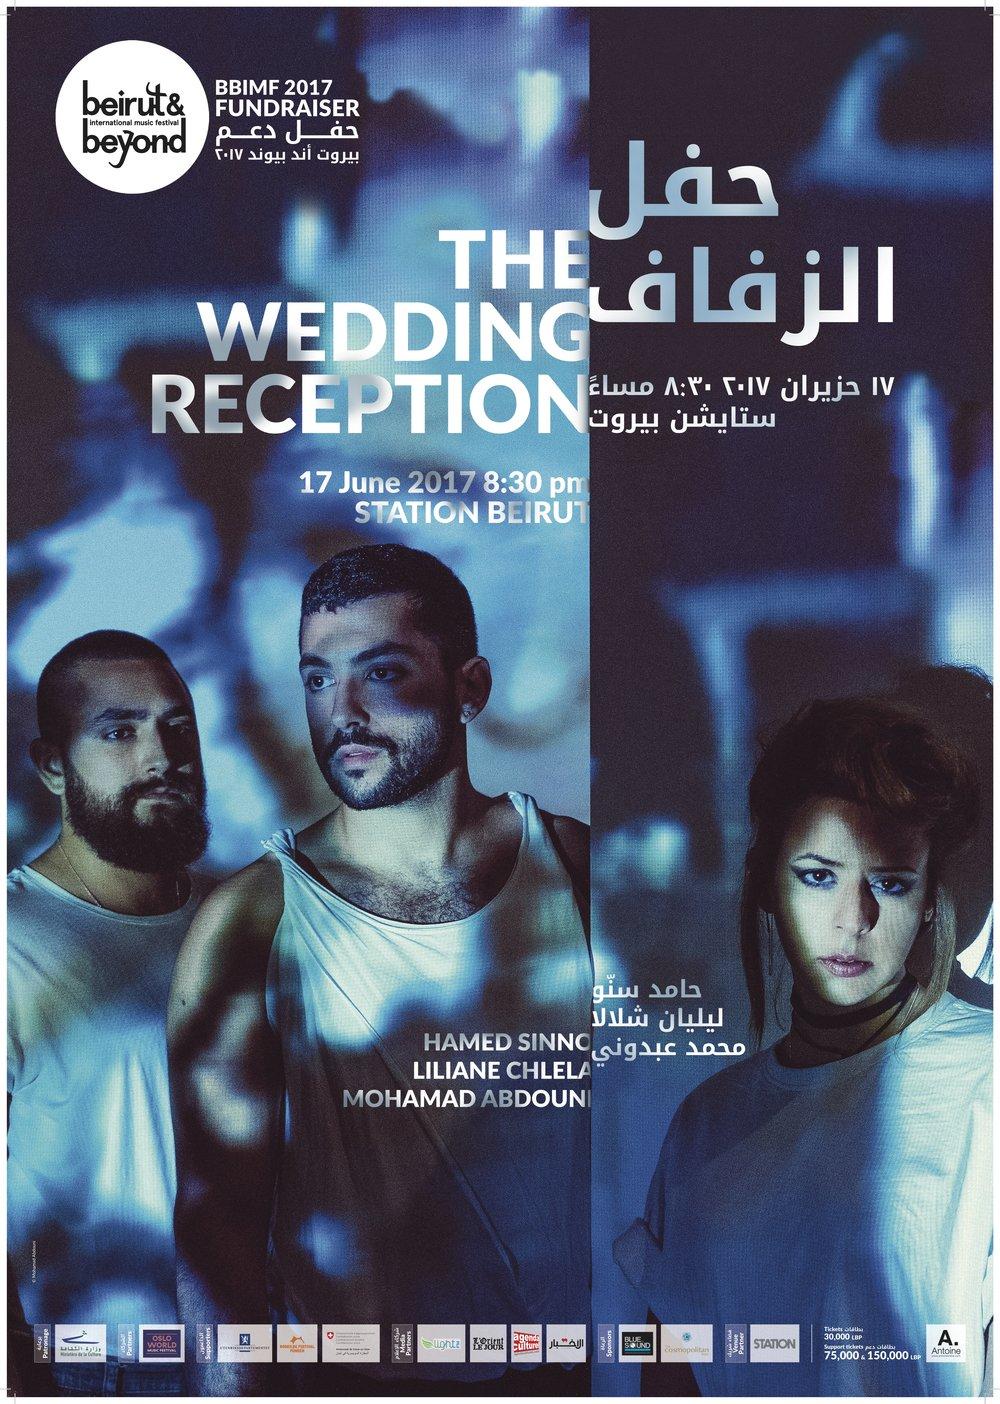 'The Wedding Reception - حفل الزفاف'